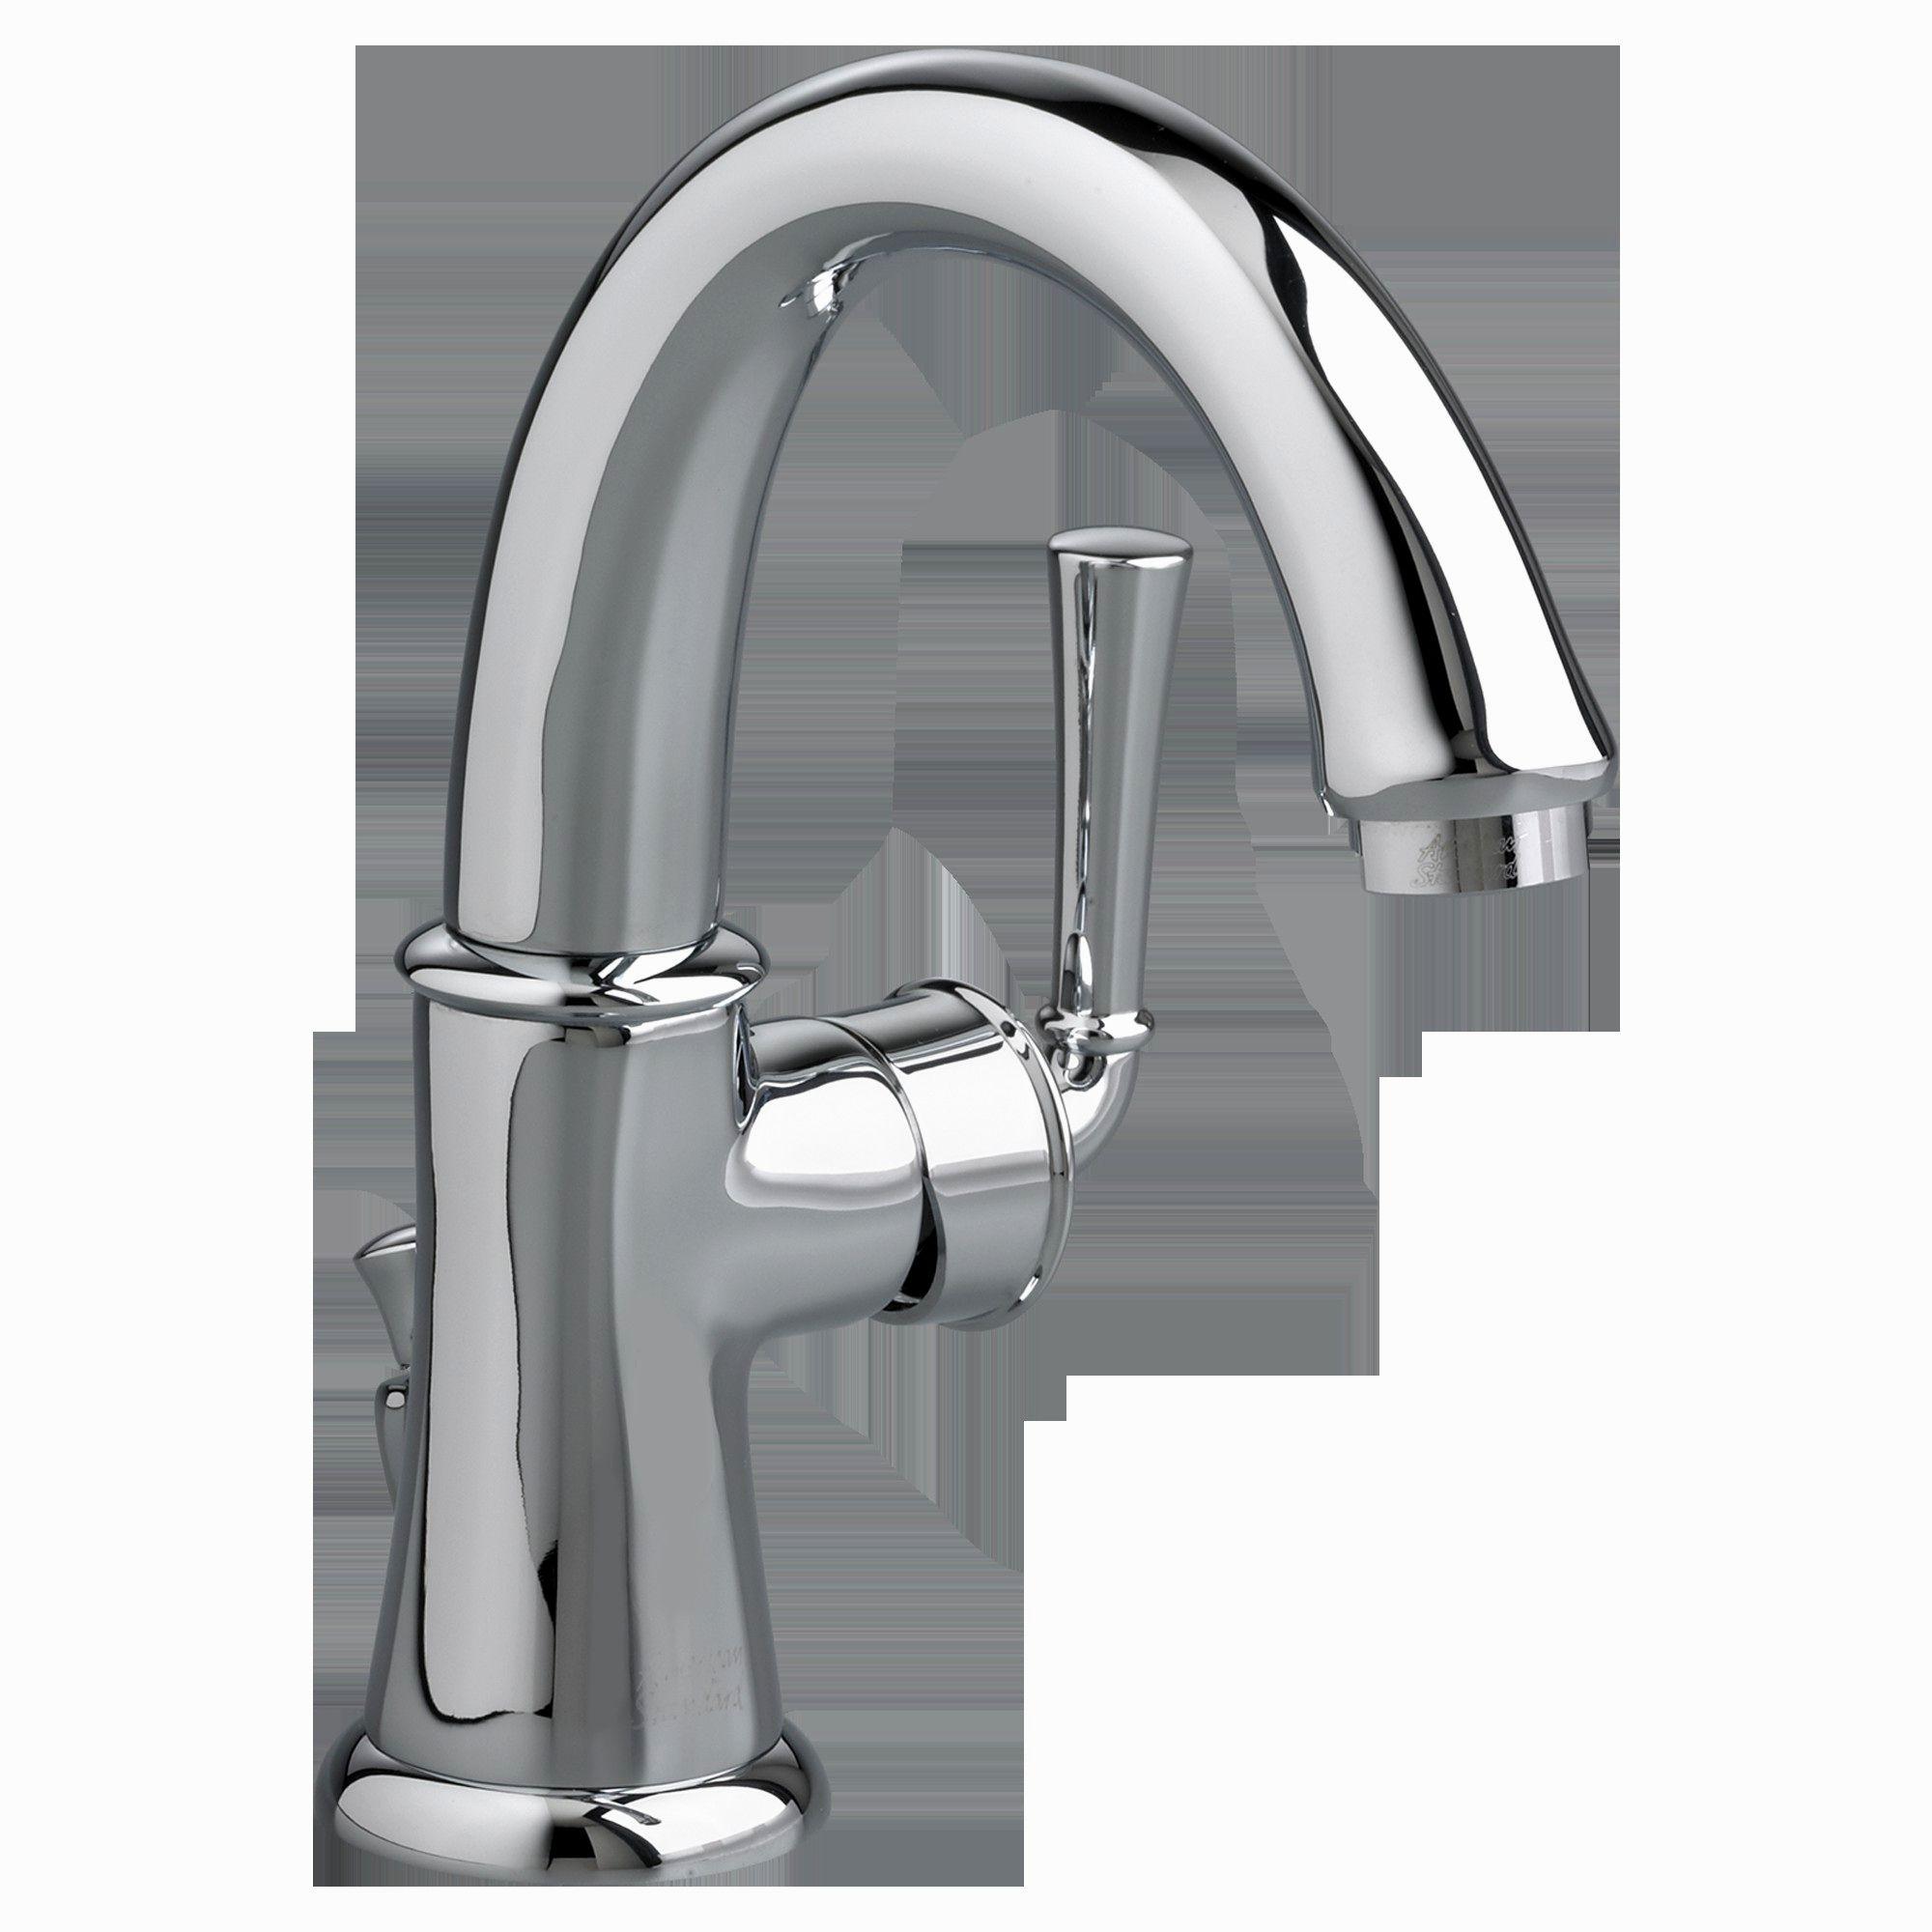 elegant grohe bathroom faucets photograph-Awesome Grohe Bathroom Faucets Layout